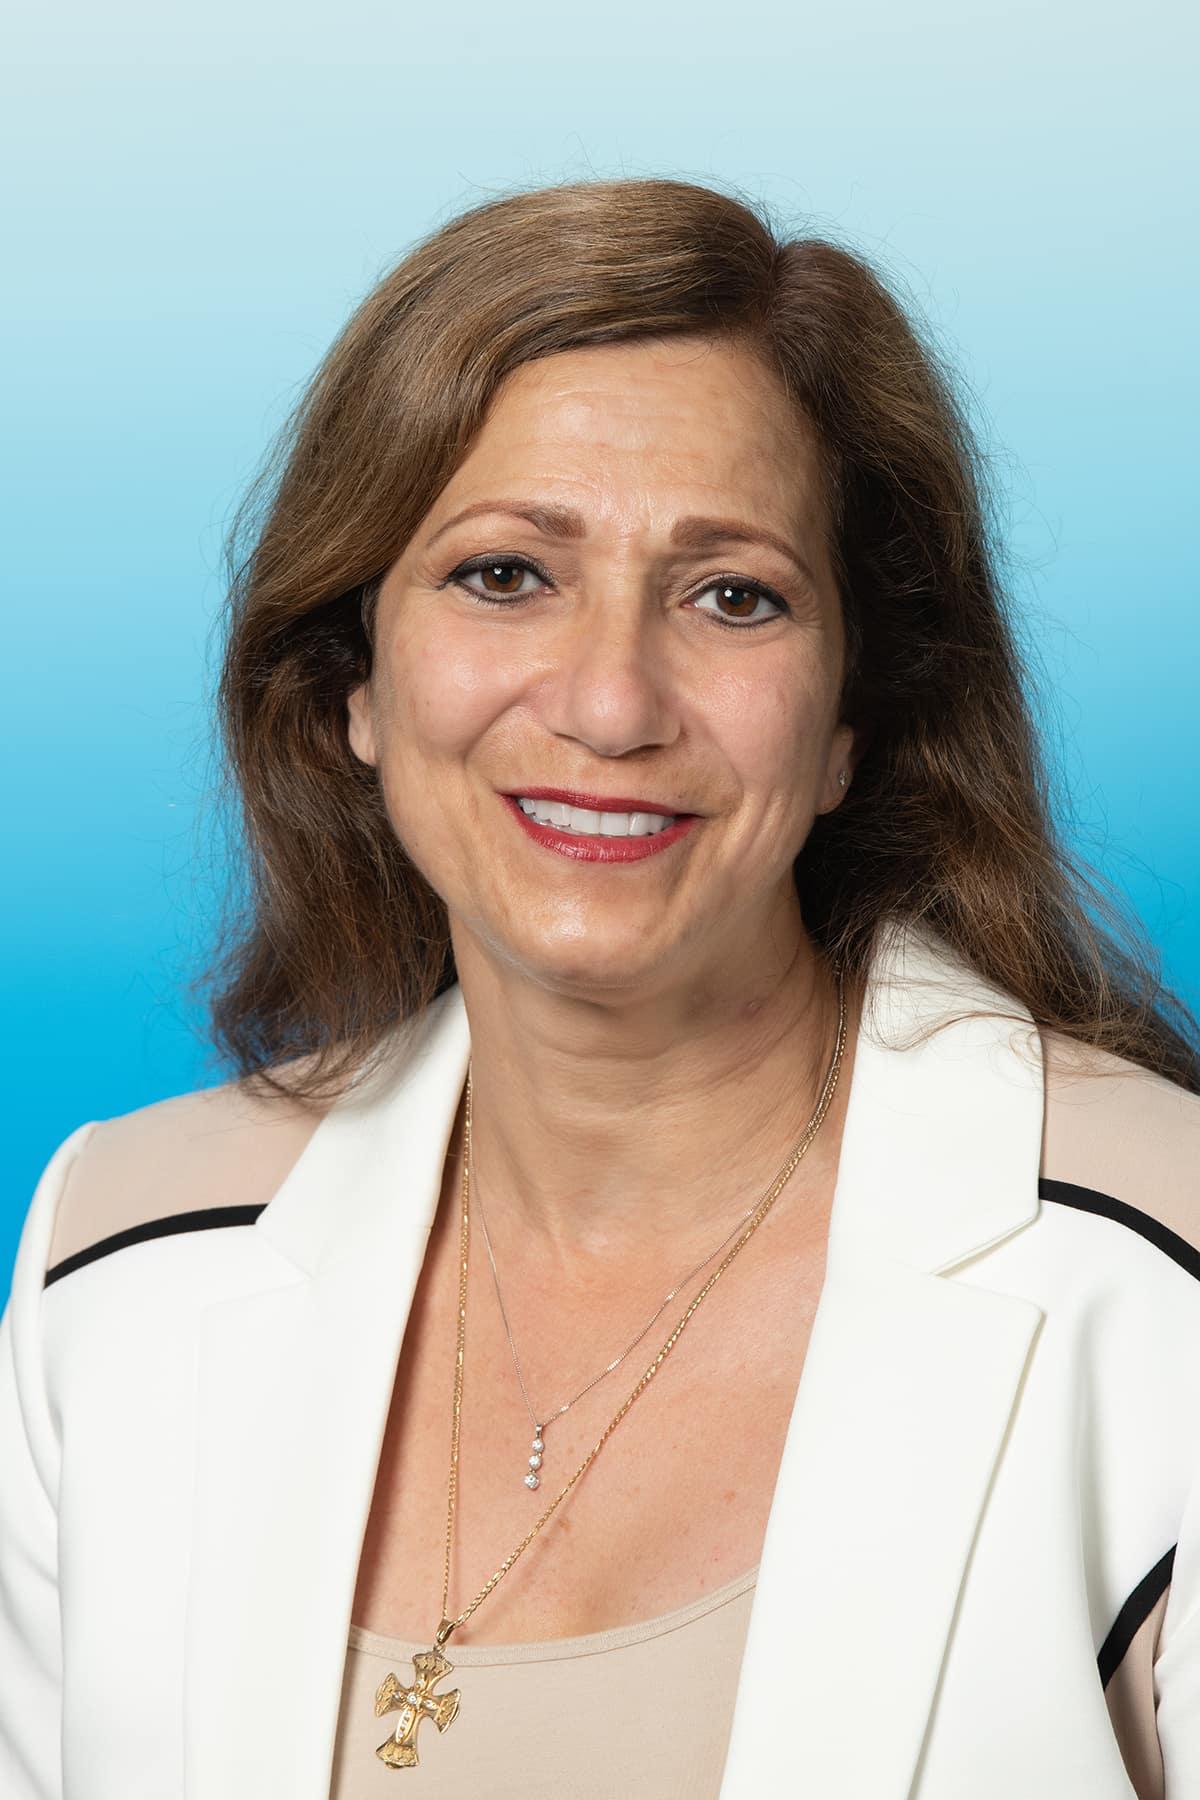 Elaine Voutsinas